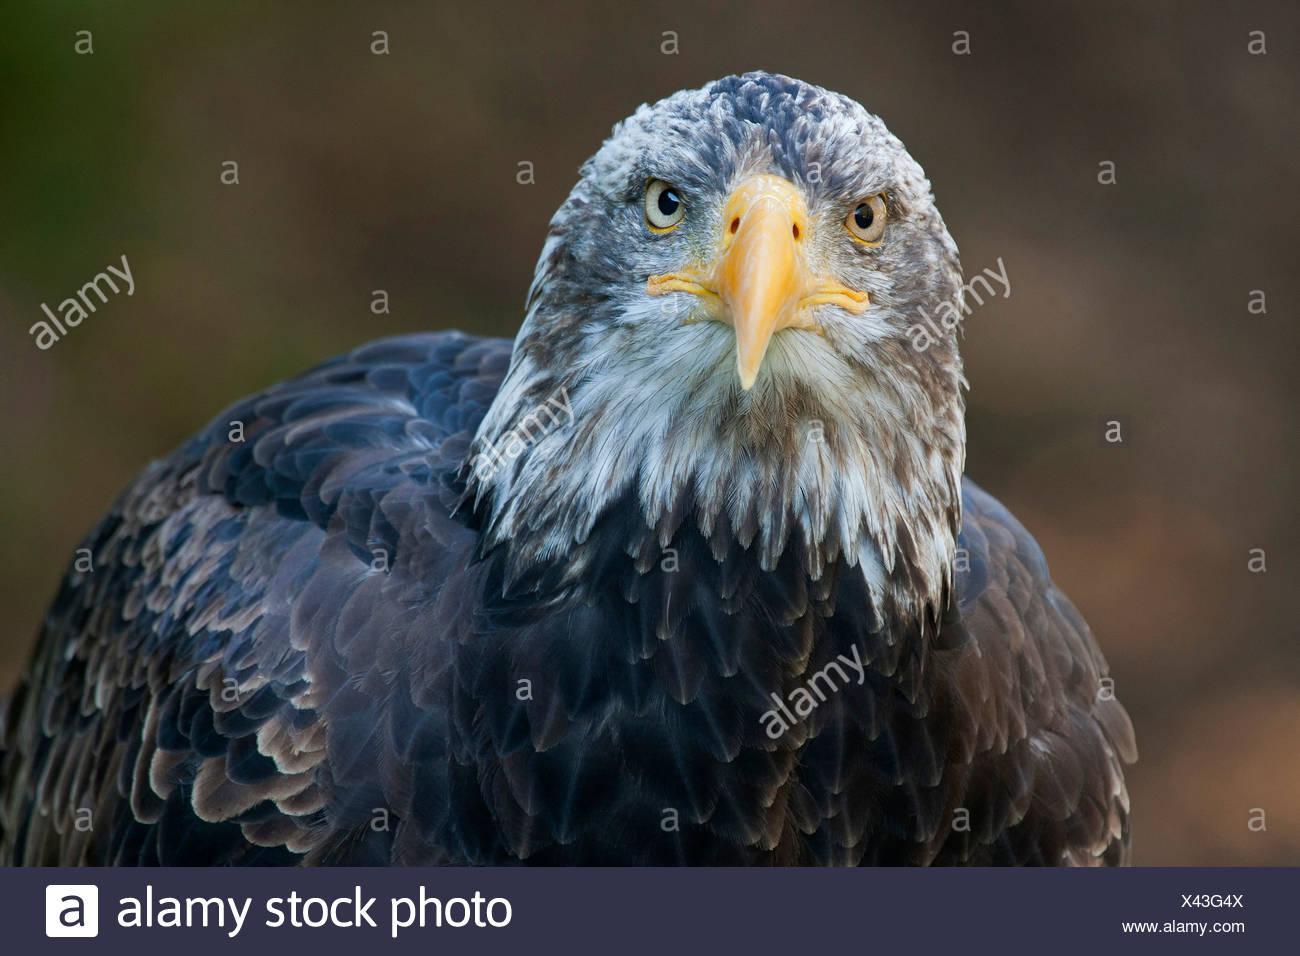 American bald eagle (Haliaeetus leucocephalus), portrait Stock Photo